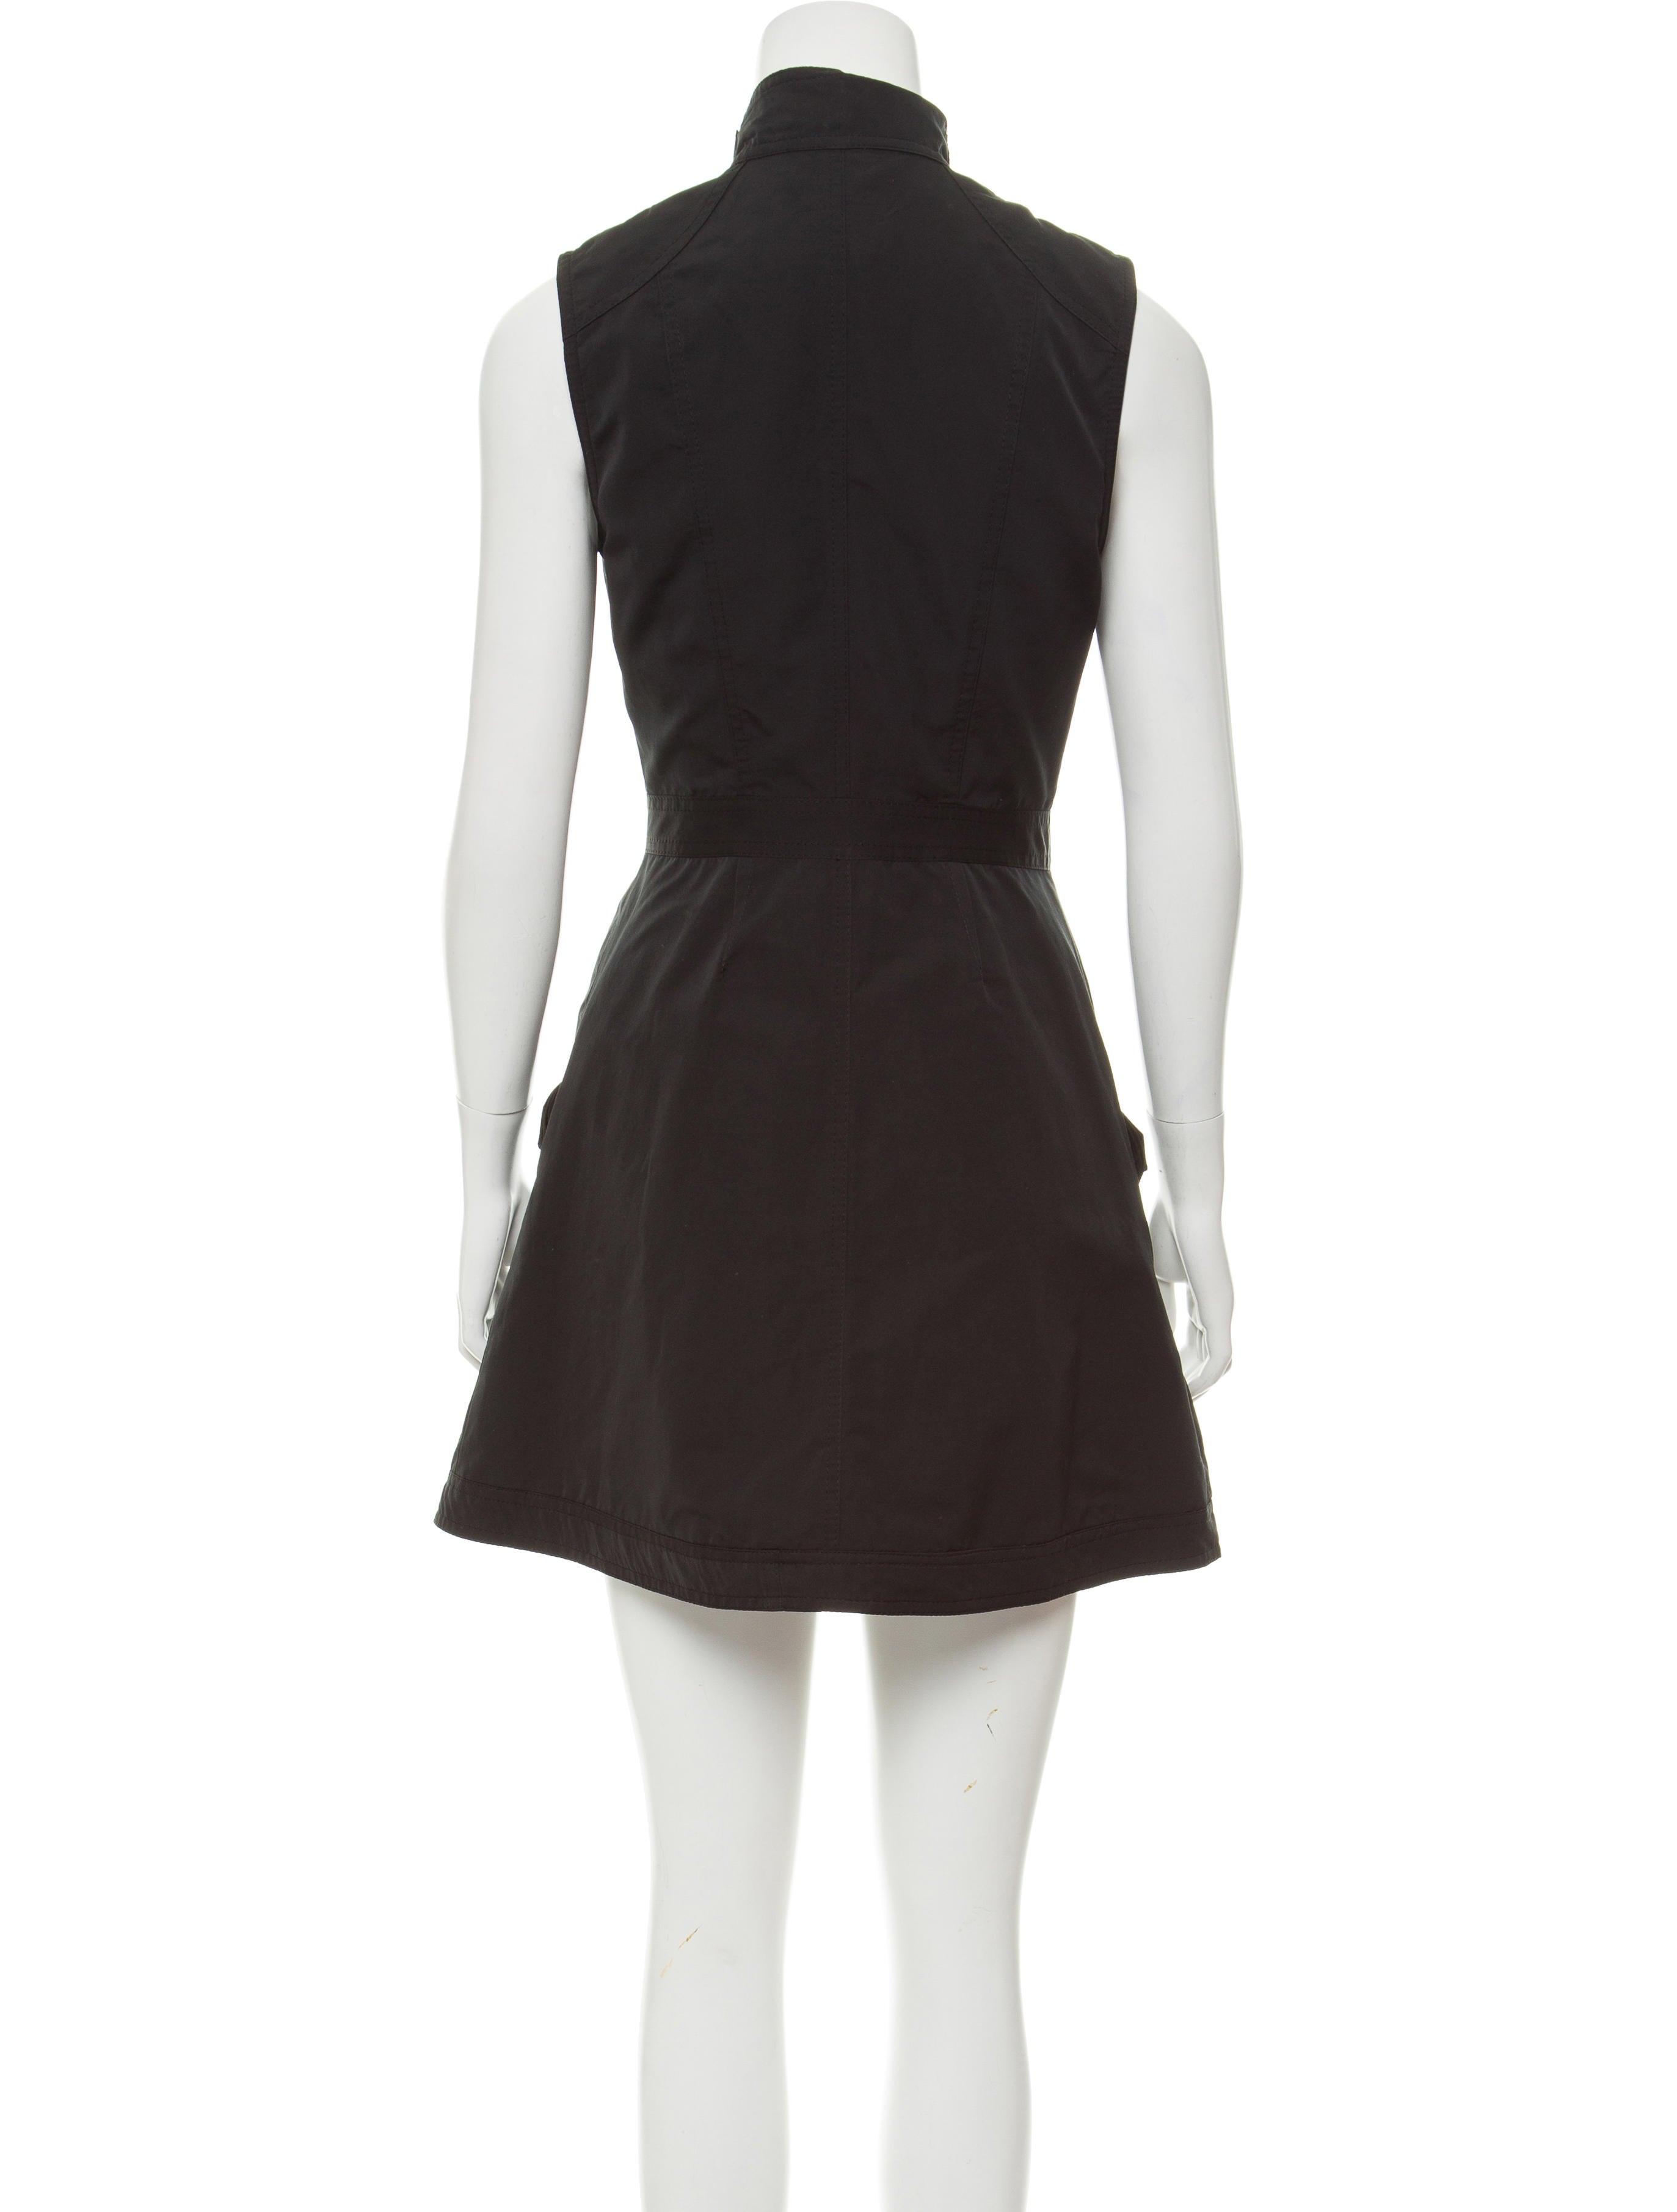 Derek Lam Sleeveless Mini Dress - Clothing